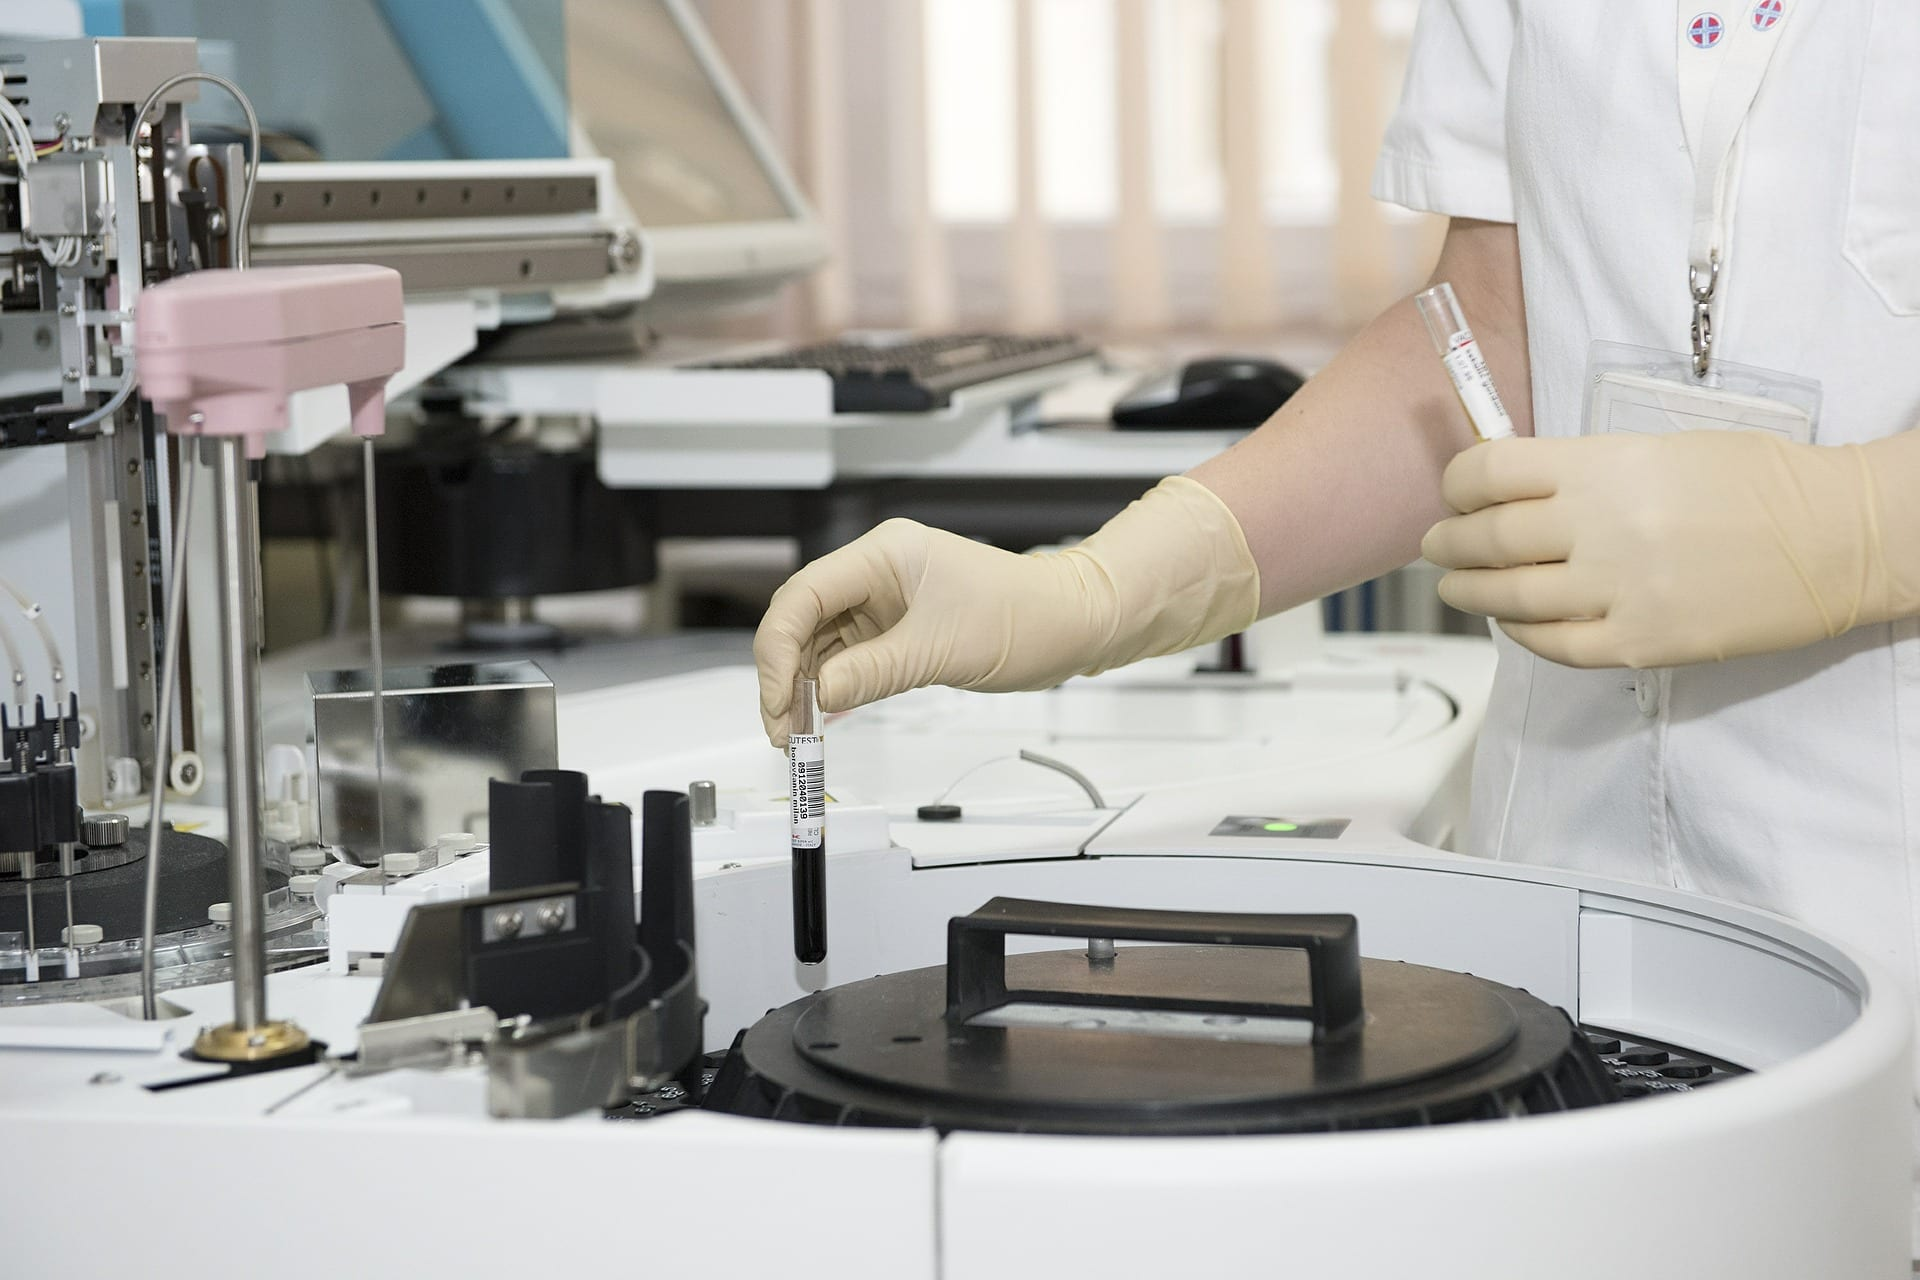 Allergan Breast Implant Lawsuits